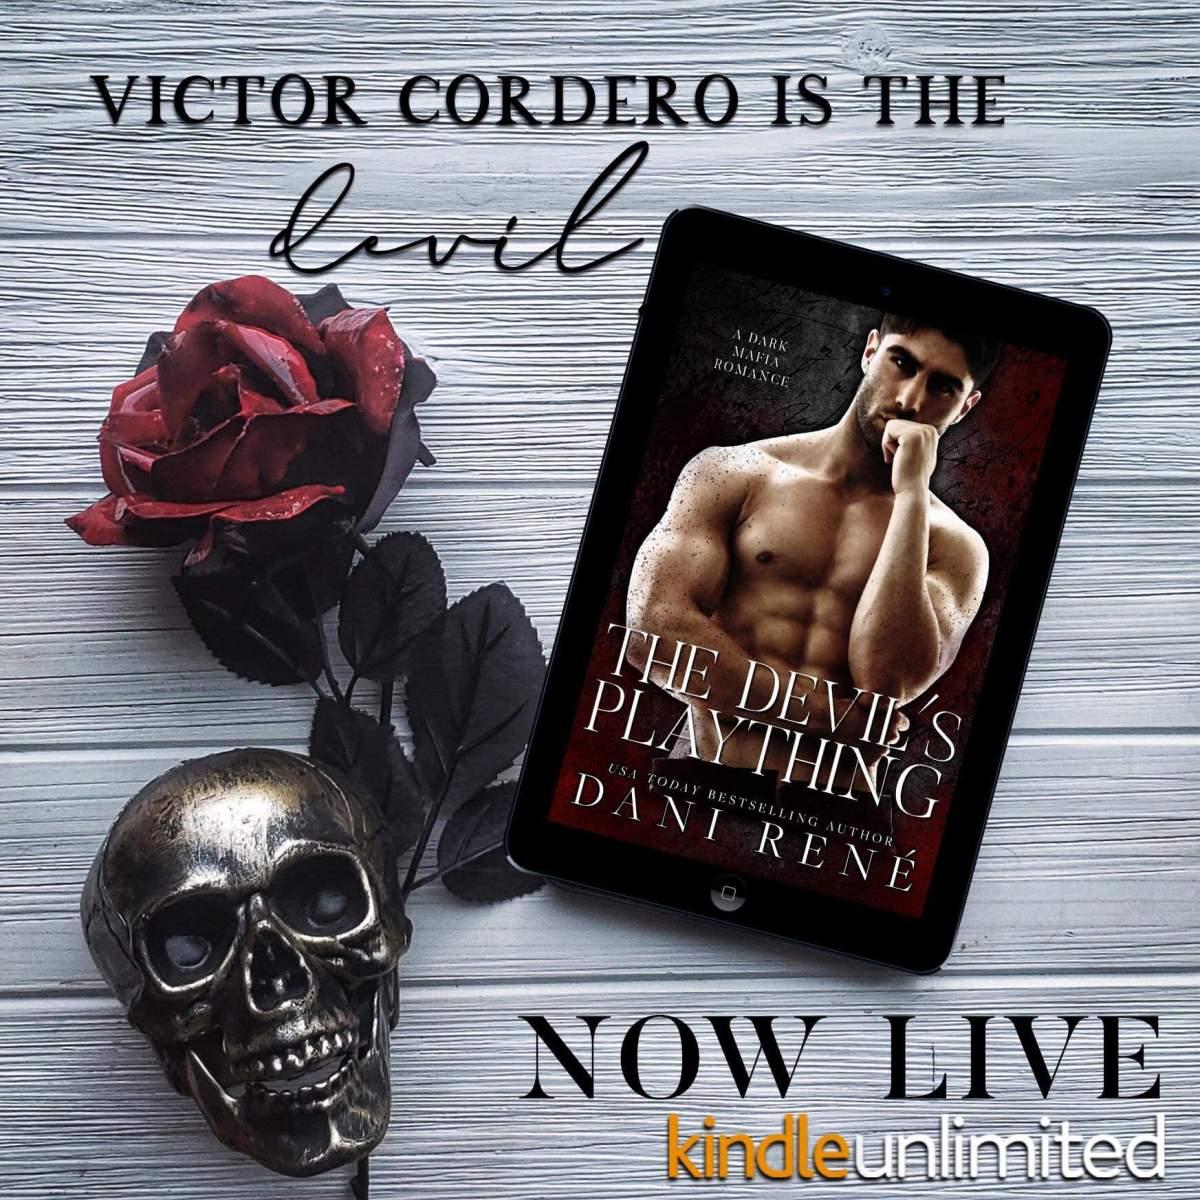 Do you like dark mafia reads? Check thisout!